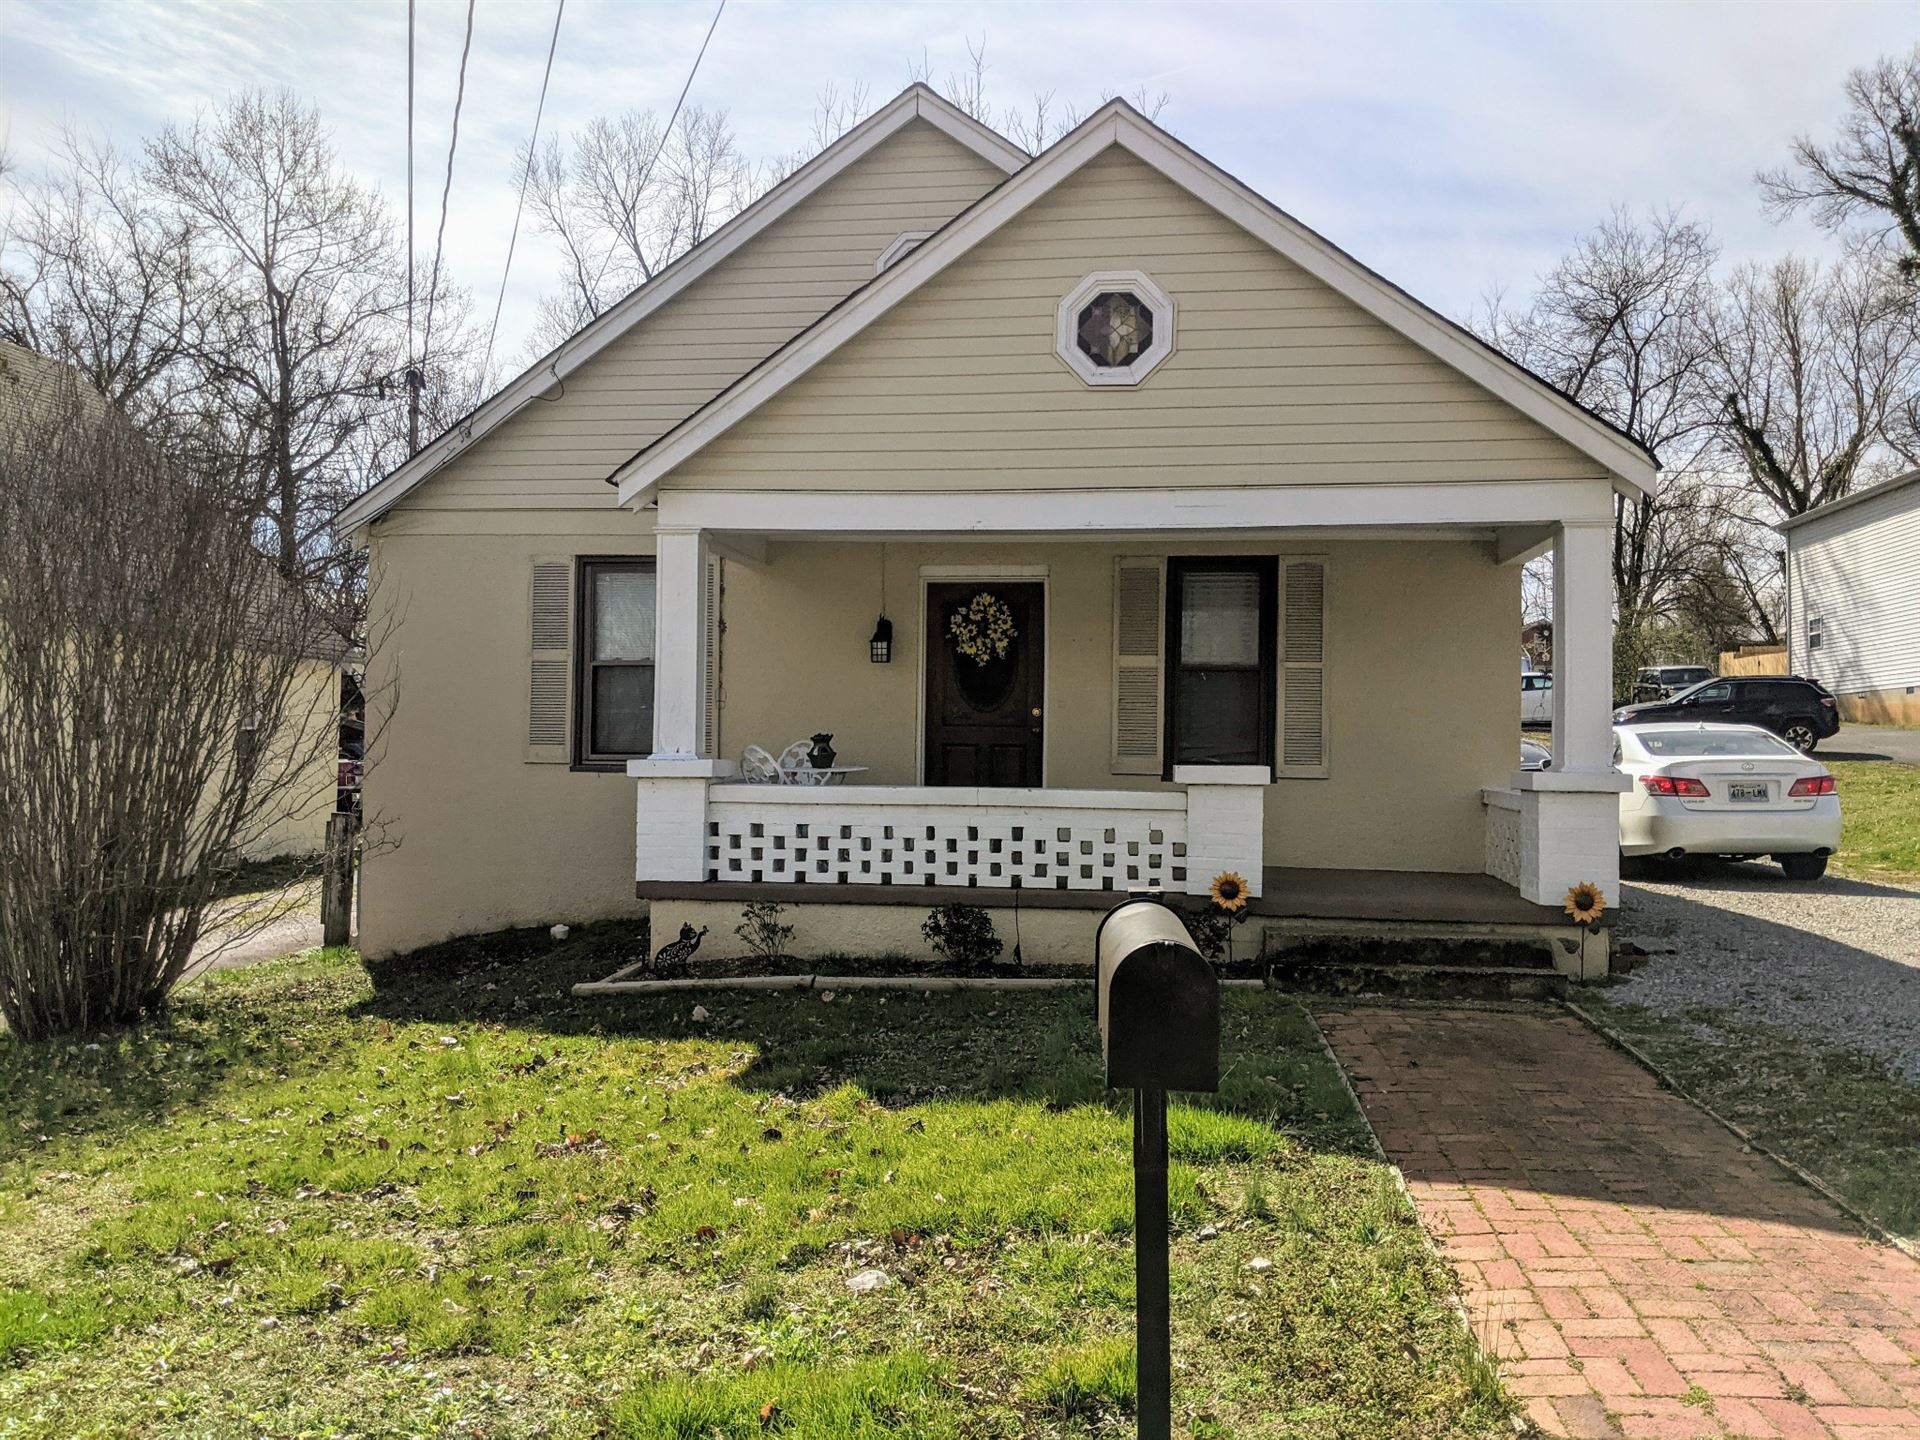 108 Warren St, McMinnville, TN 37110 - MLS#: 2234100